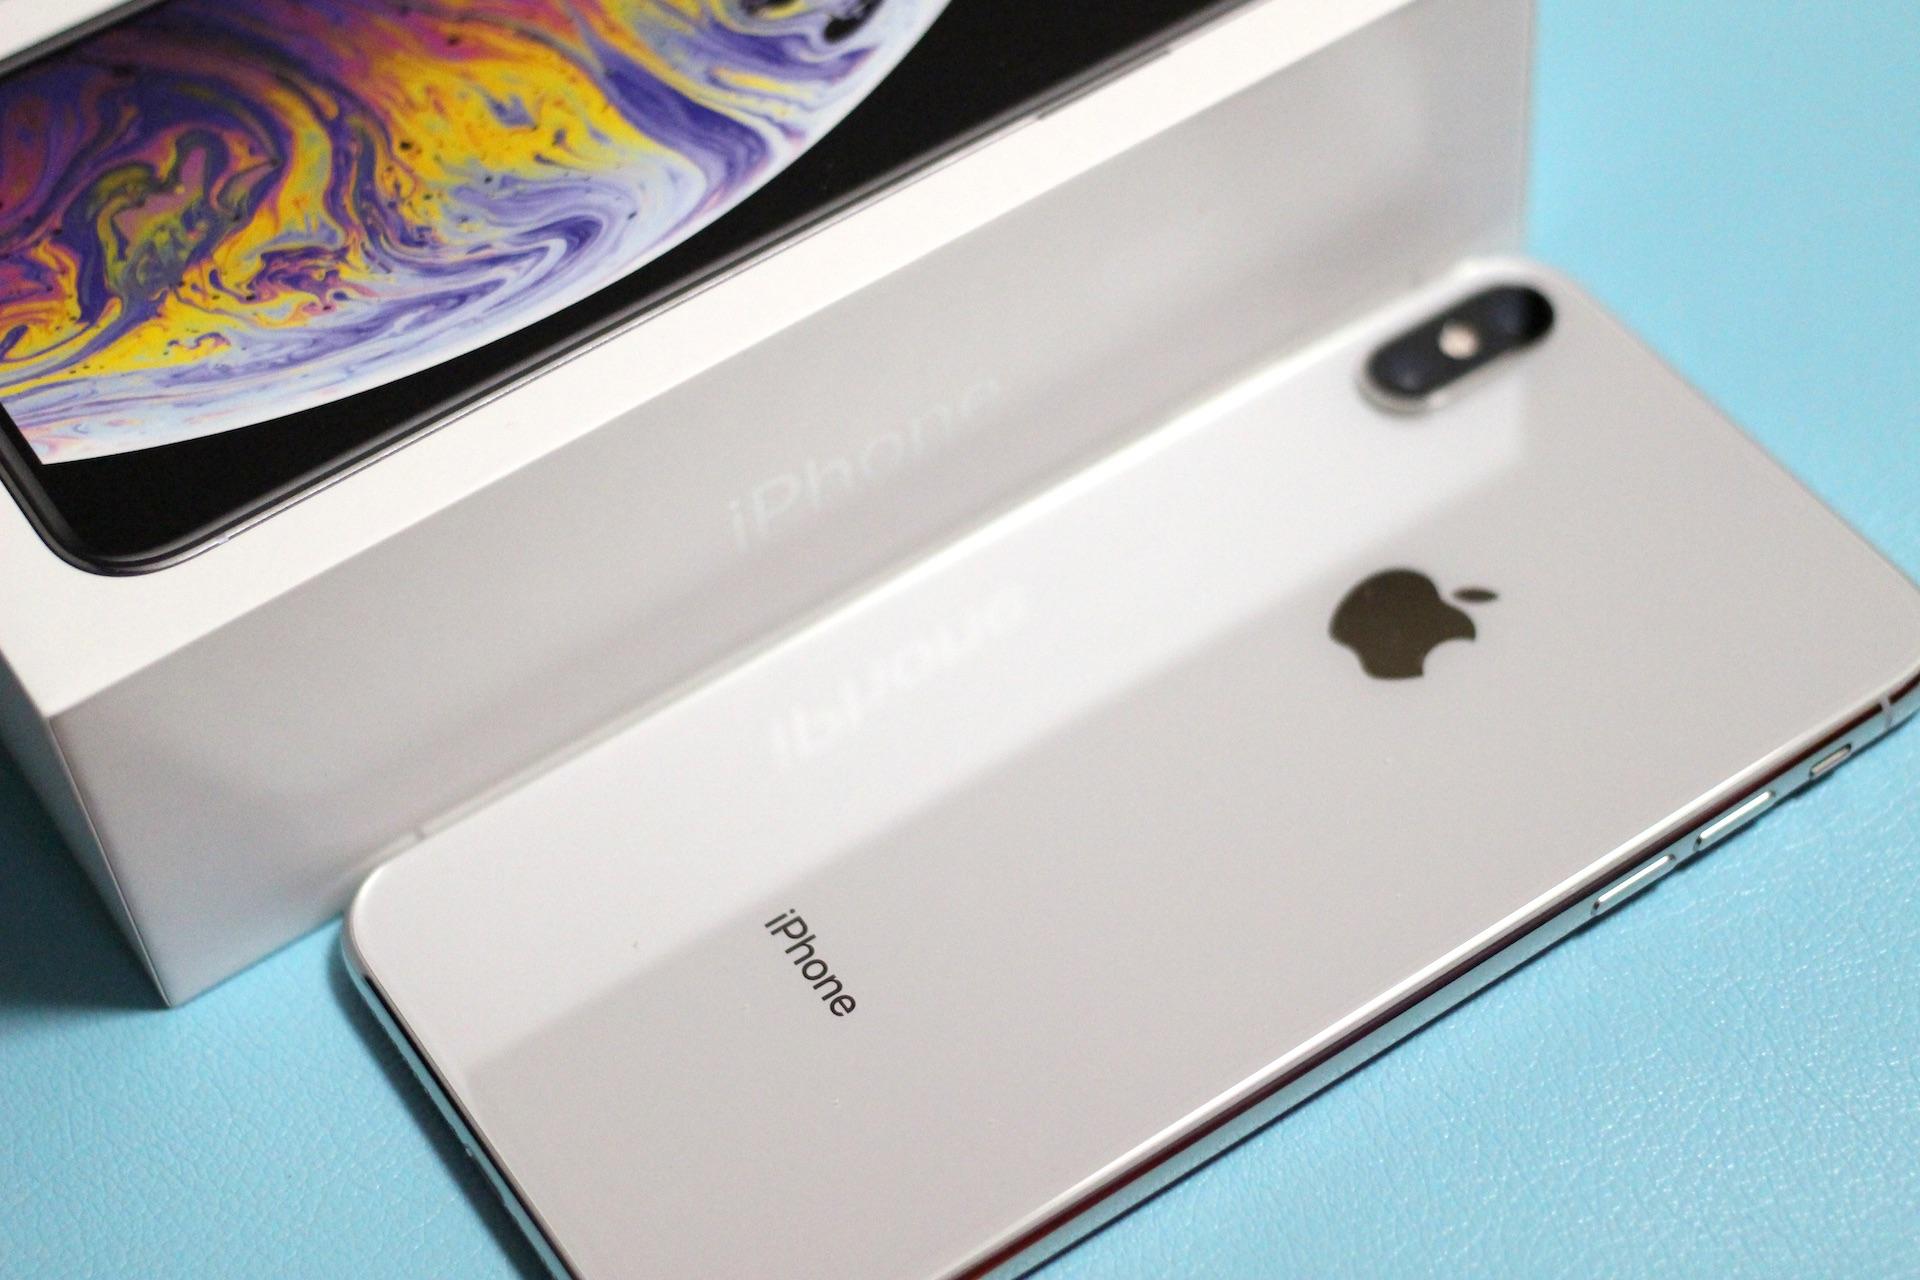 iPhone XS MaxのSIMフリー版がヨドバシカメラとビックカメラの公式 ...